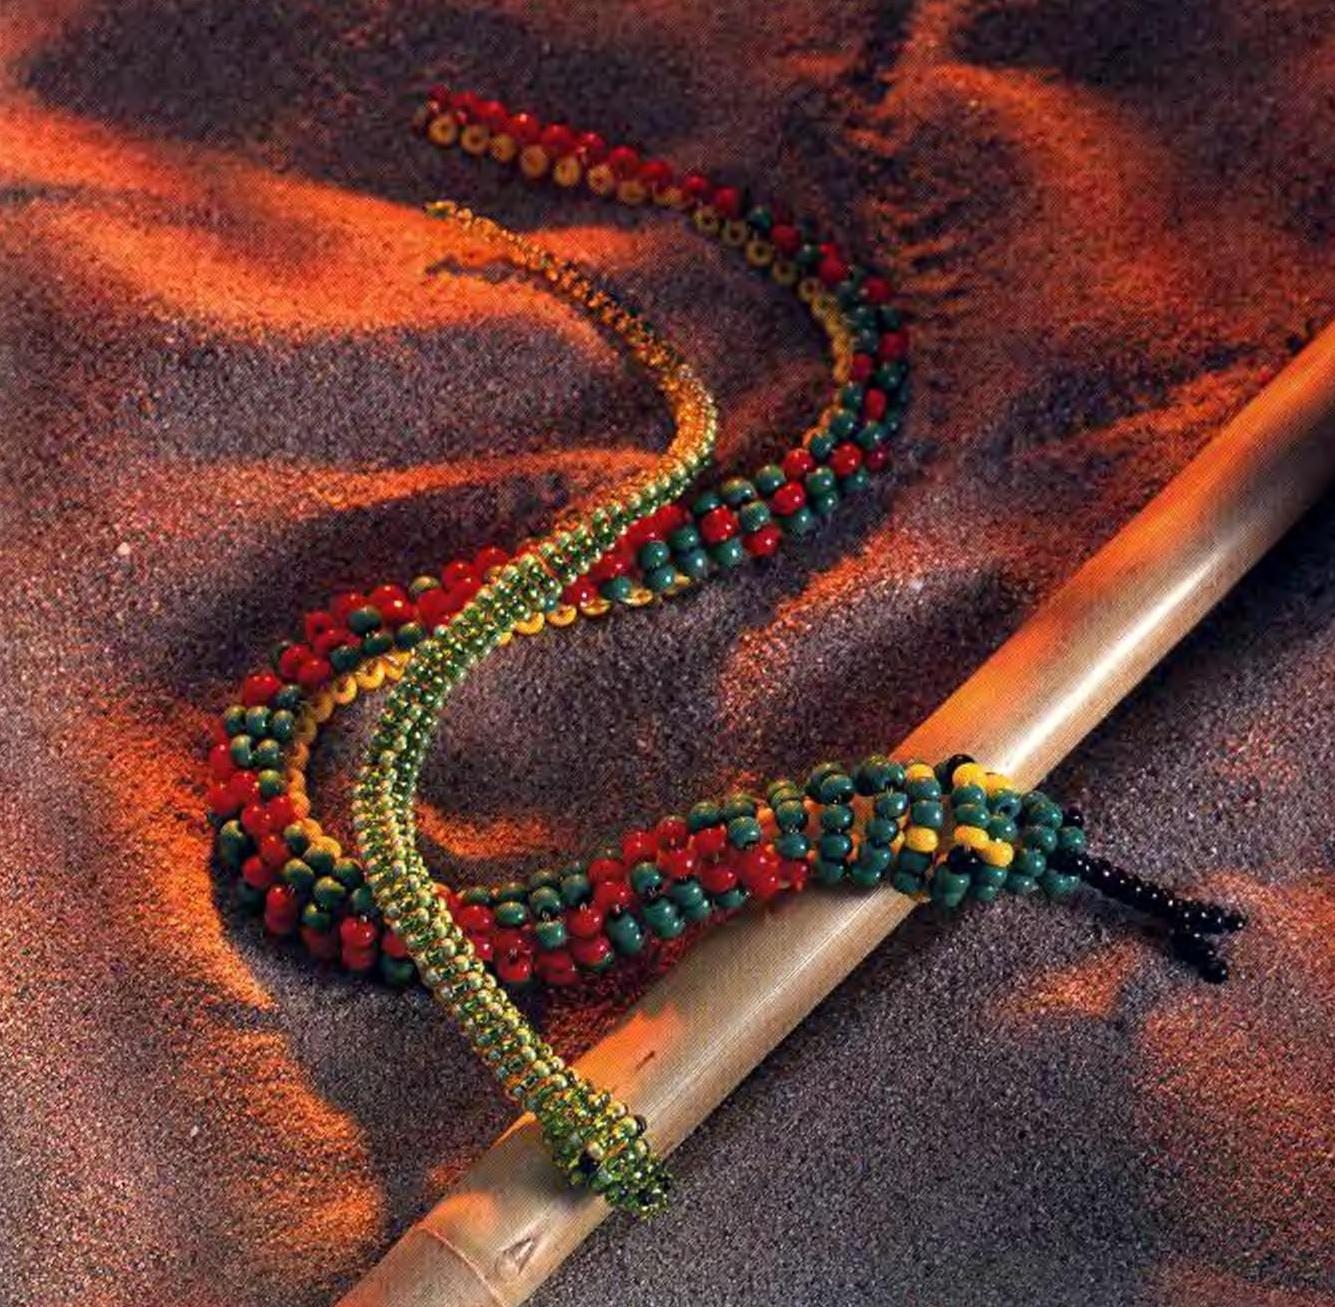 Бисероплетение змеи - Делаем фенечки своими руками.